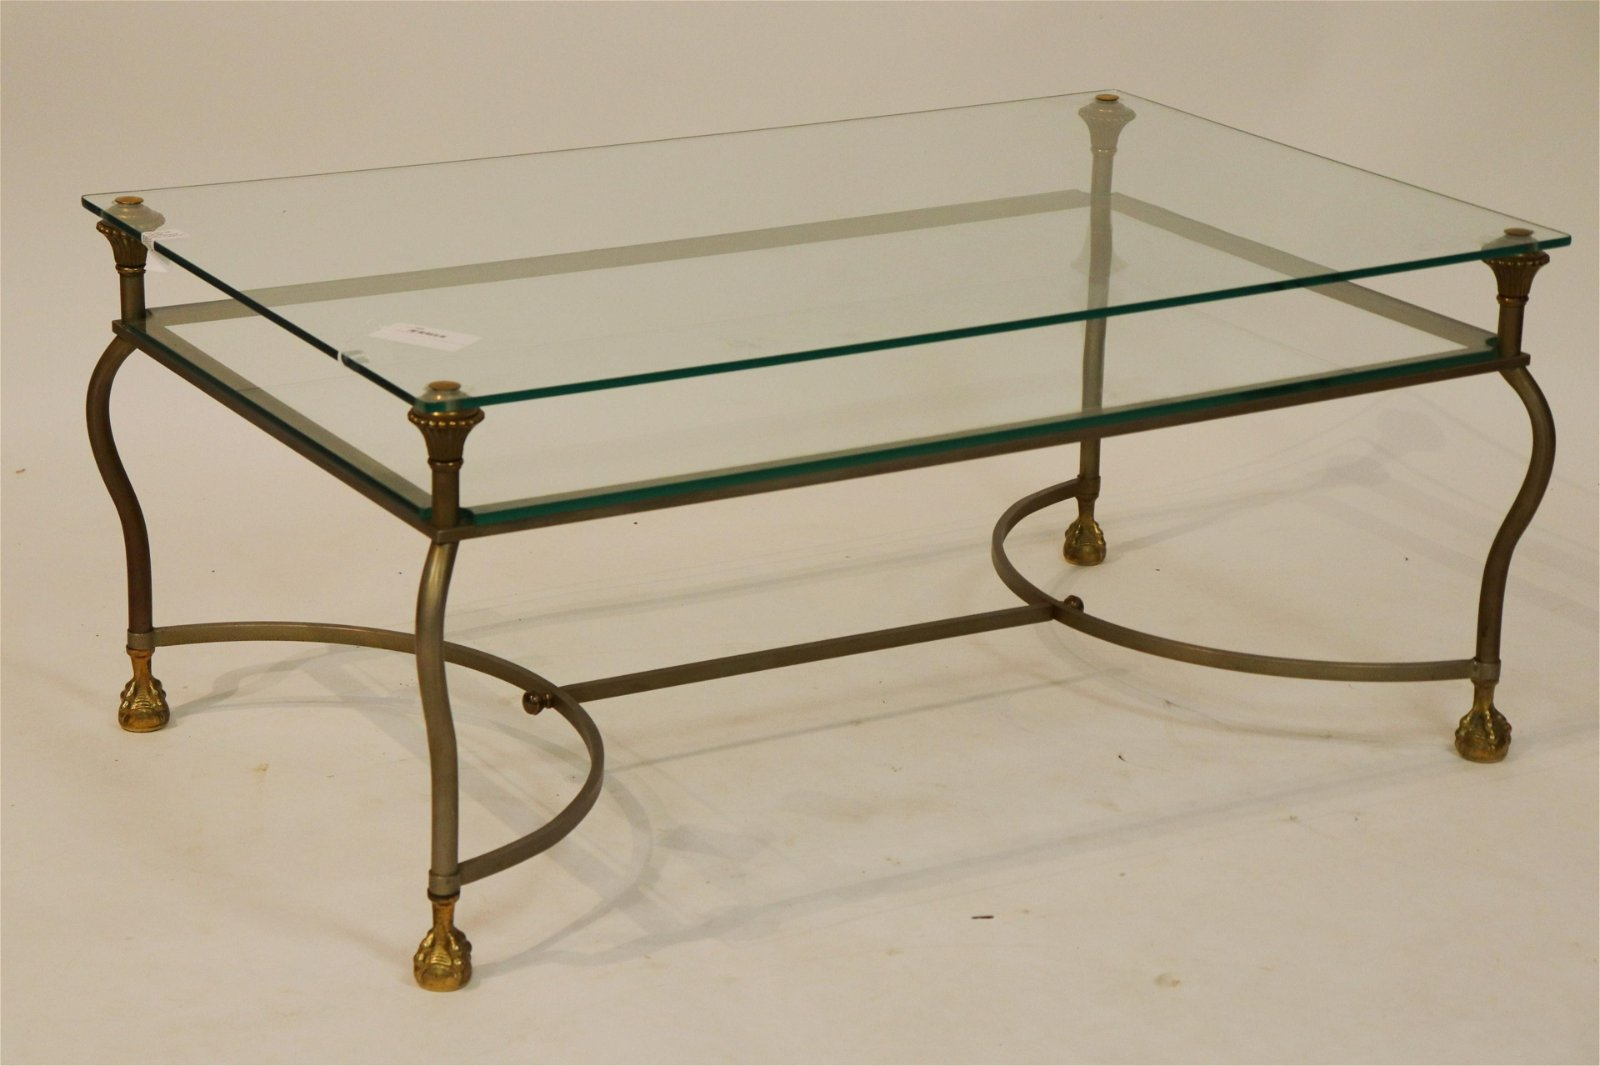 Brass & Glass 2-Tier Coffee Table